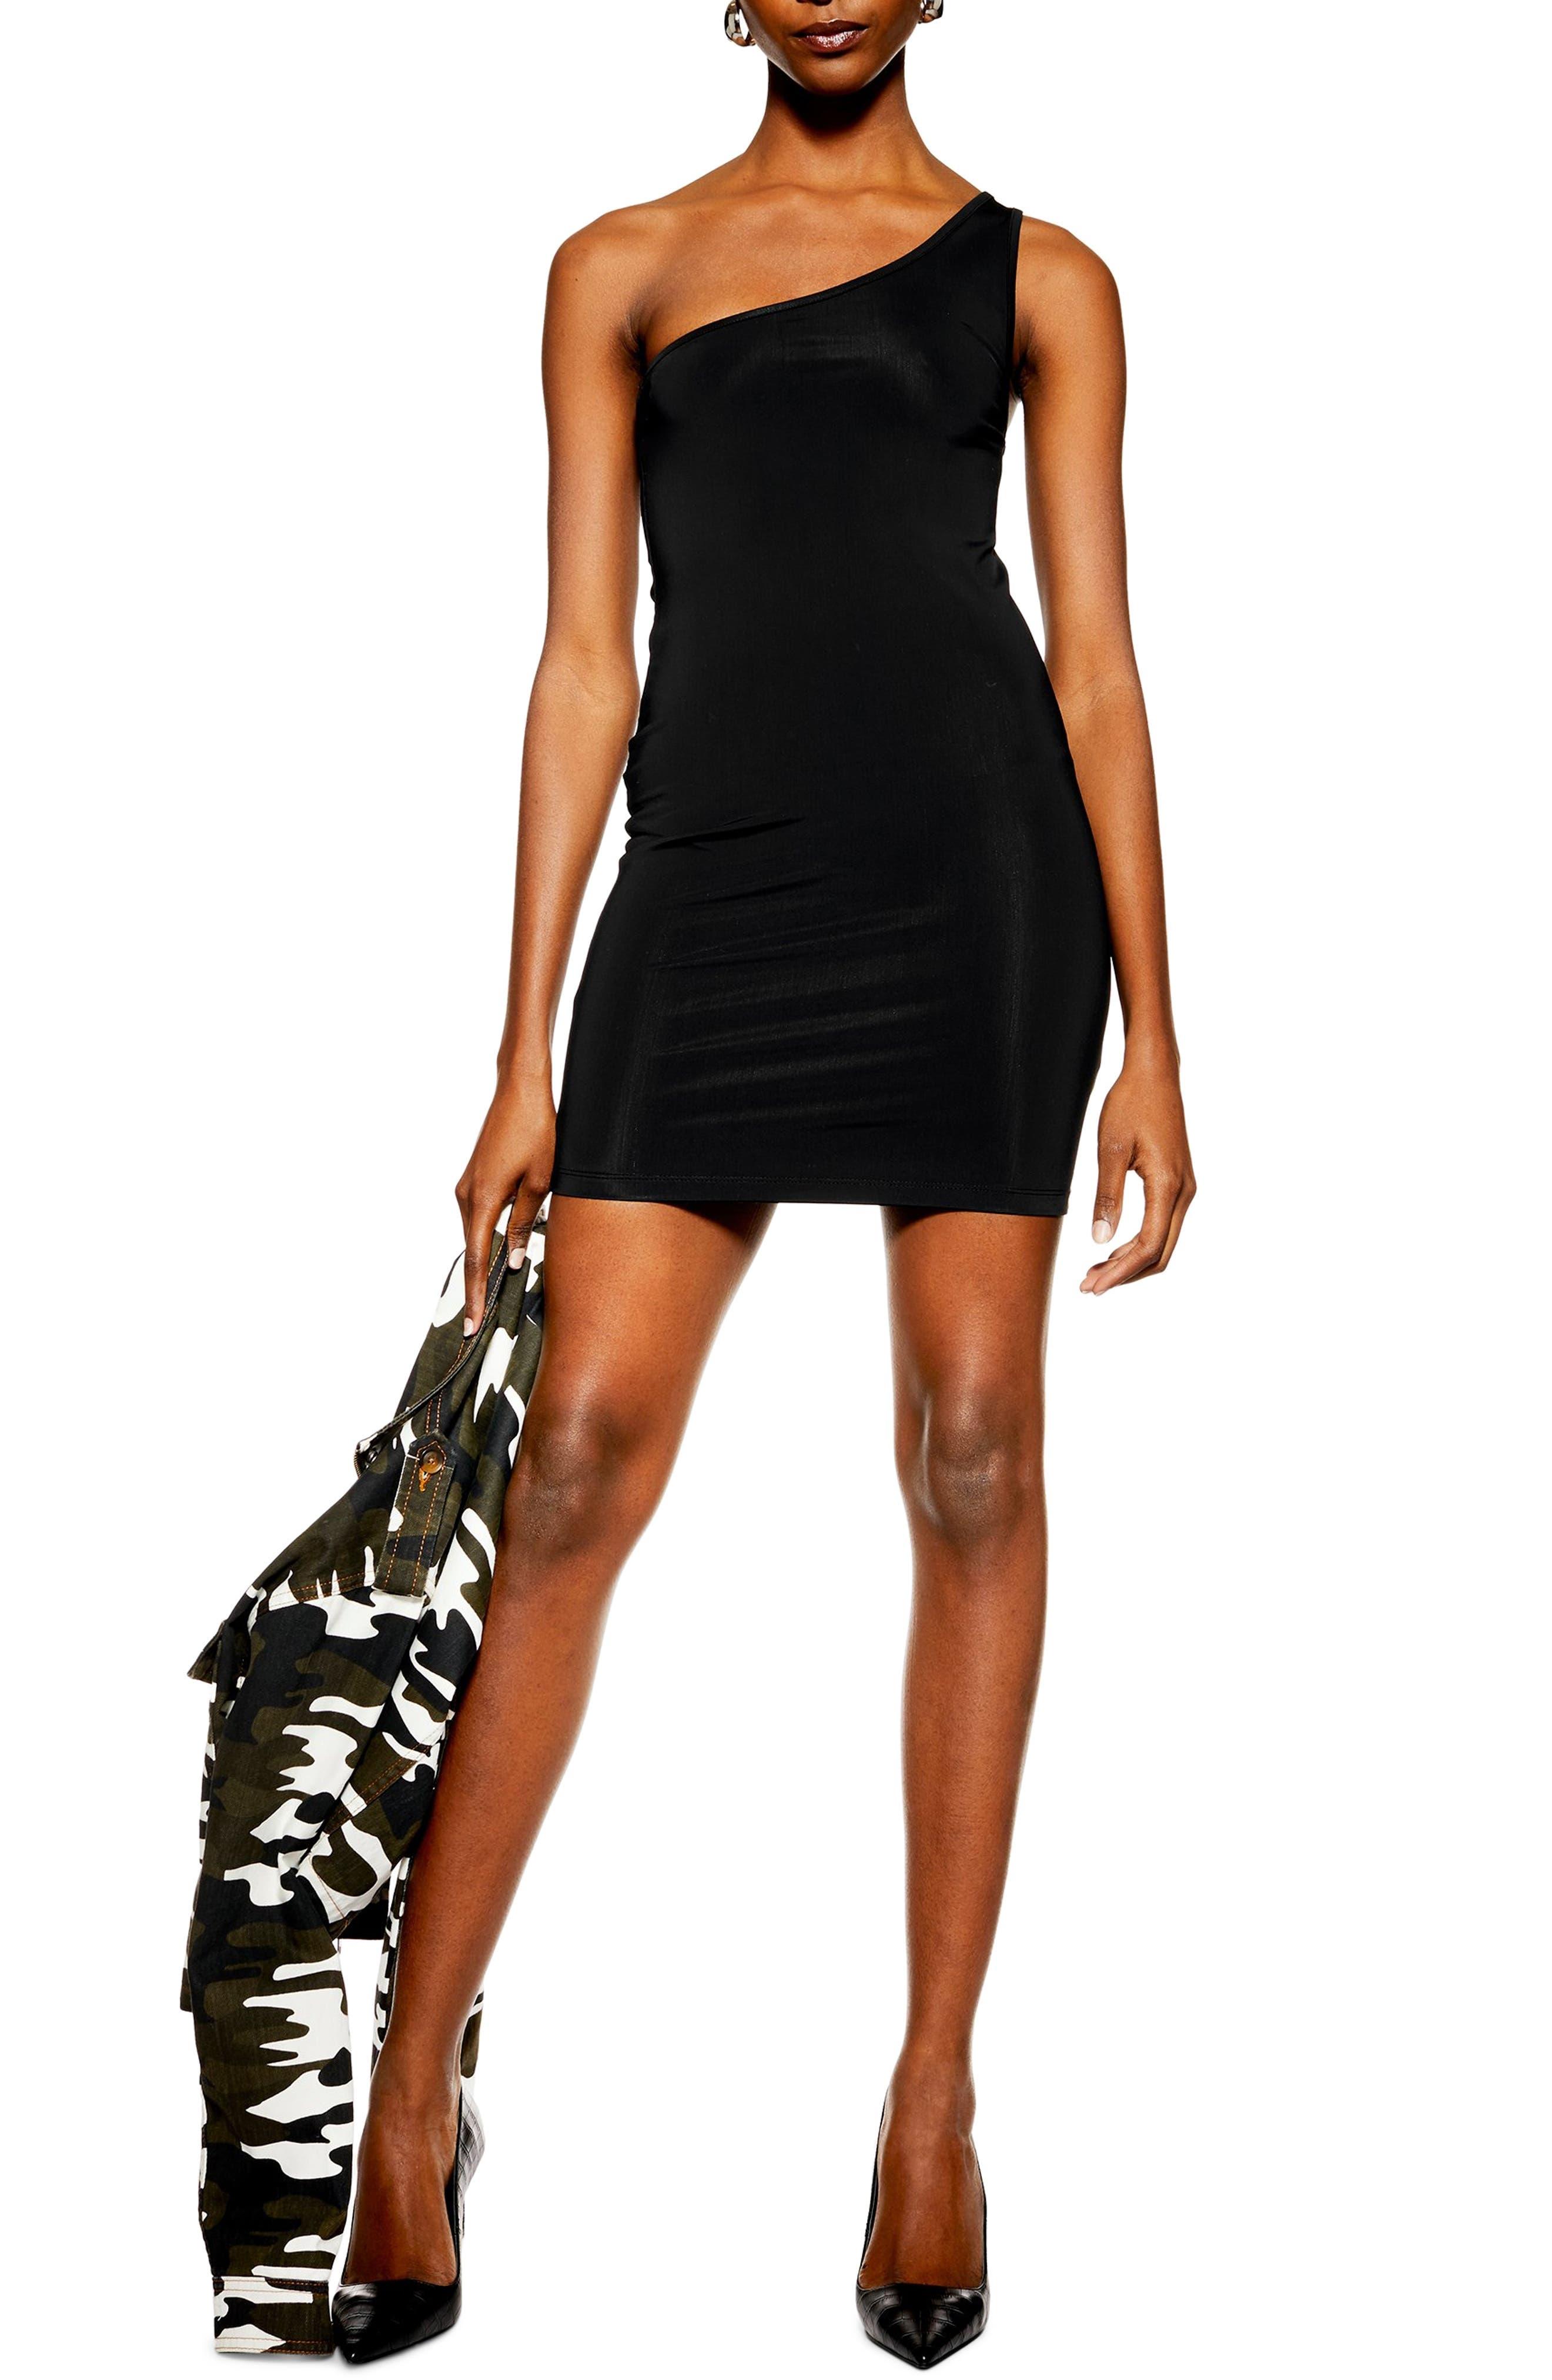 Topshop One-Shoulder Body-Con Minidress, US (fits like 2-4) - Black